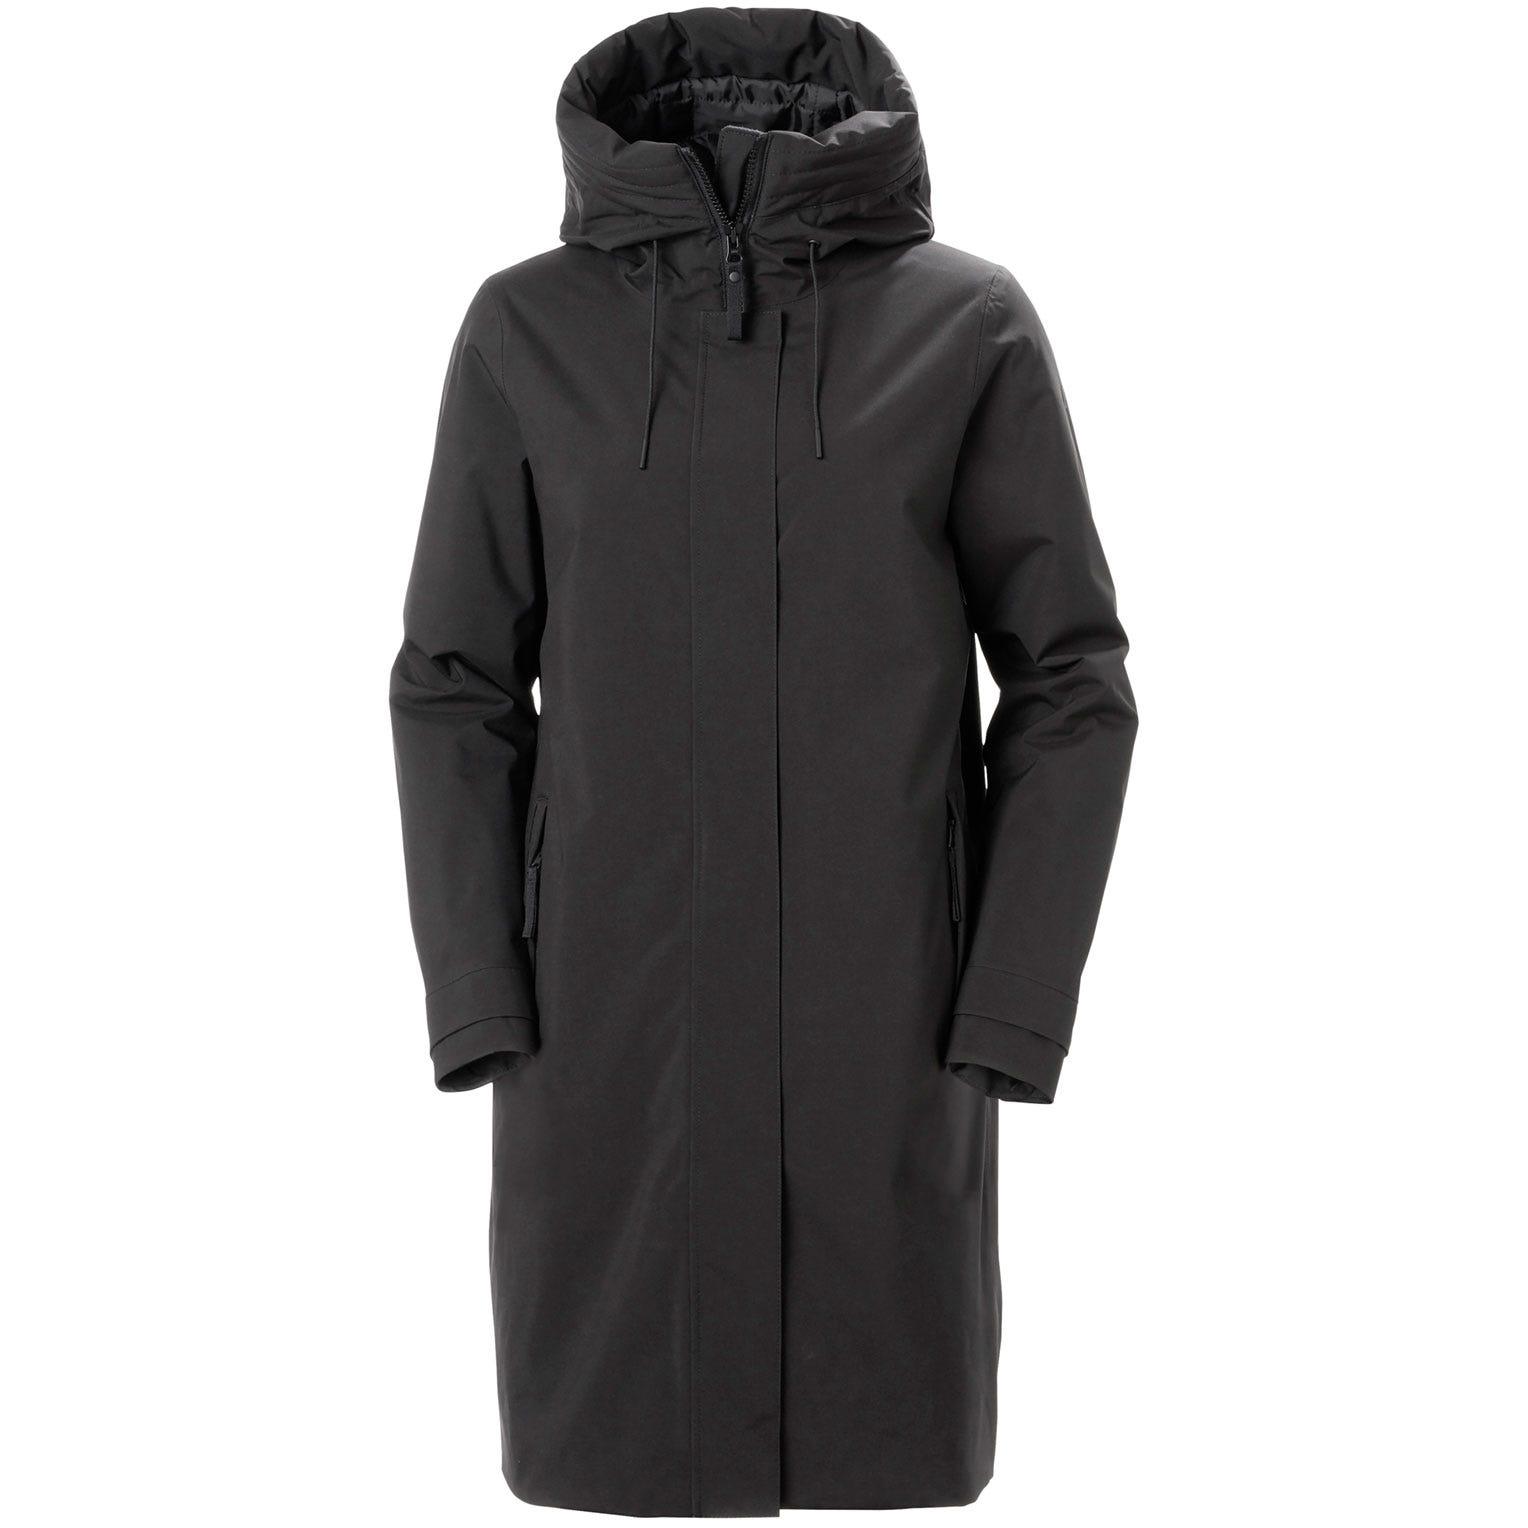 Helly Hansen Womens Victoria Insulated Rain Coat Parka Black S